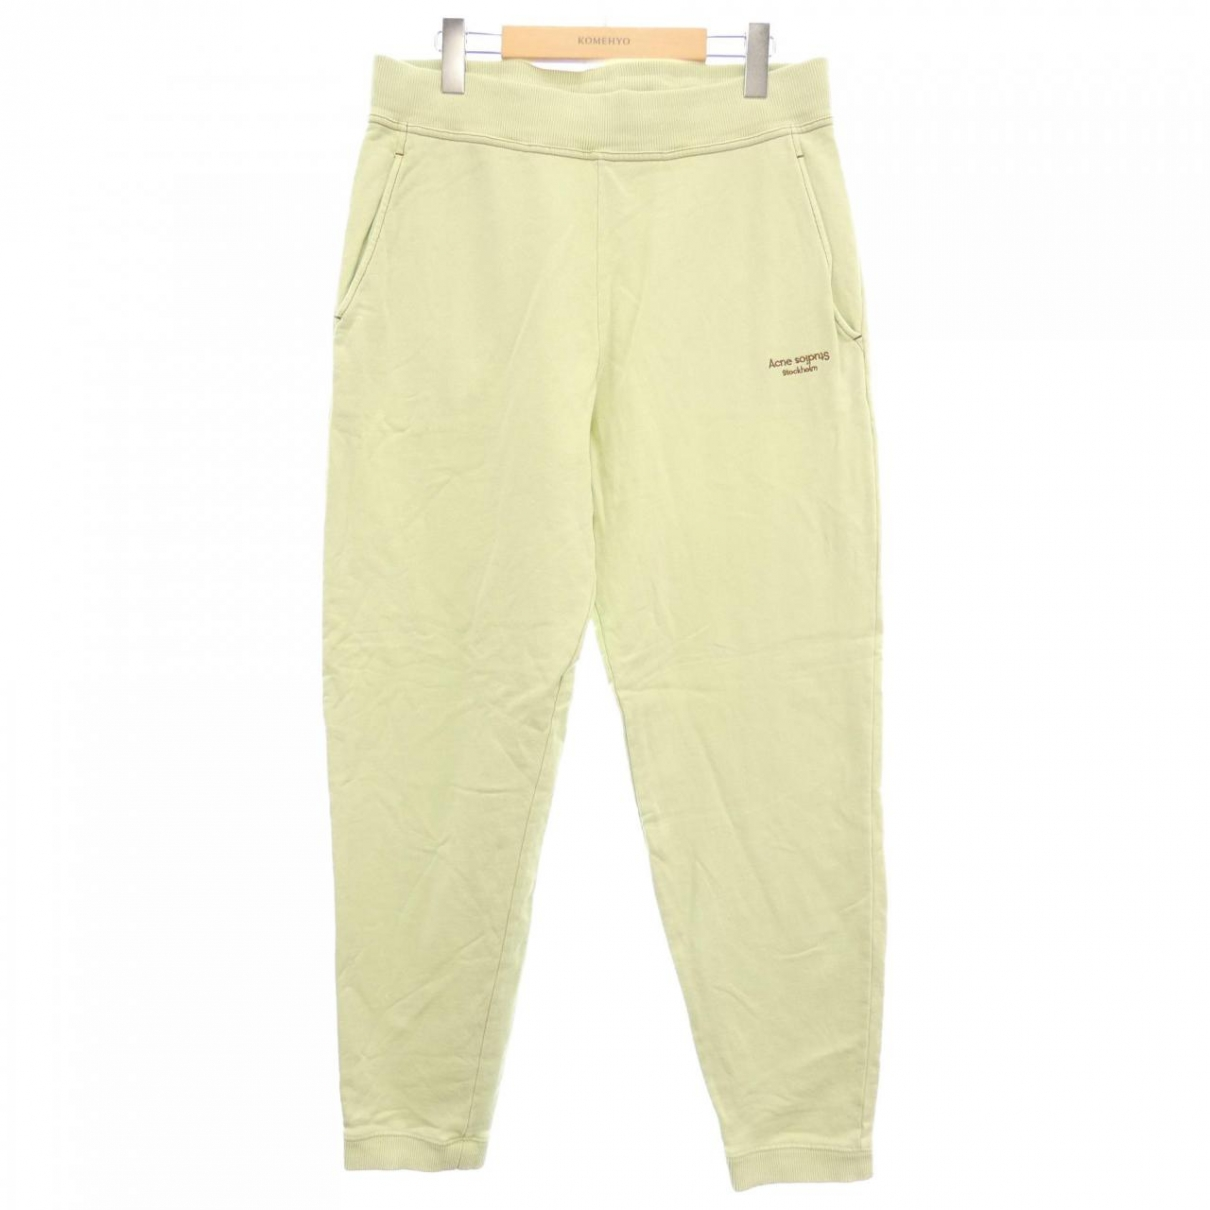 Acne Studios \N Green Cotton Trousers for Men S International